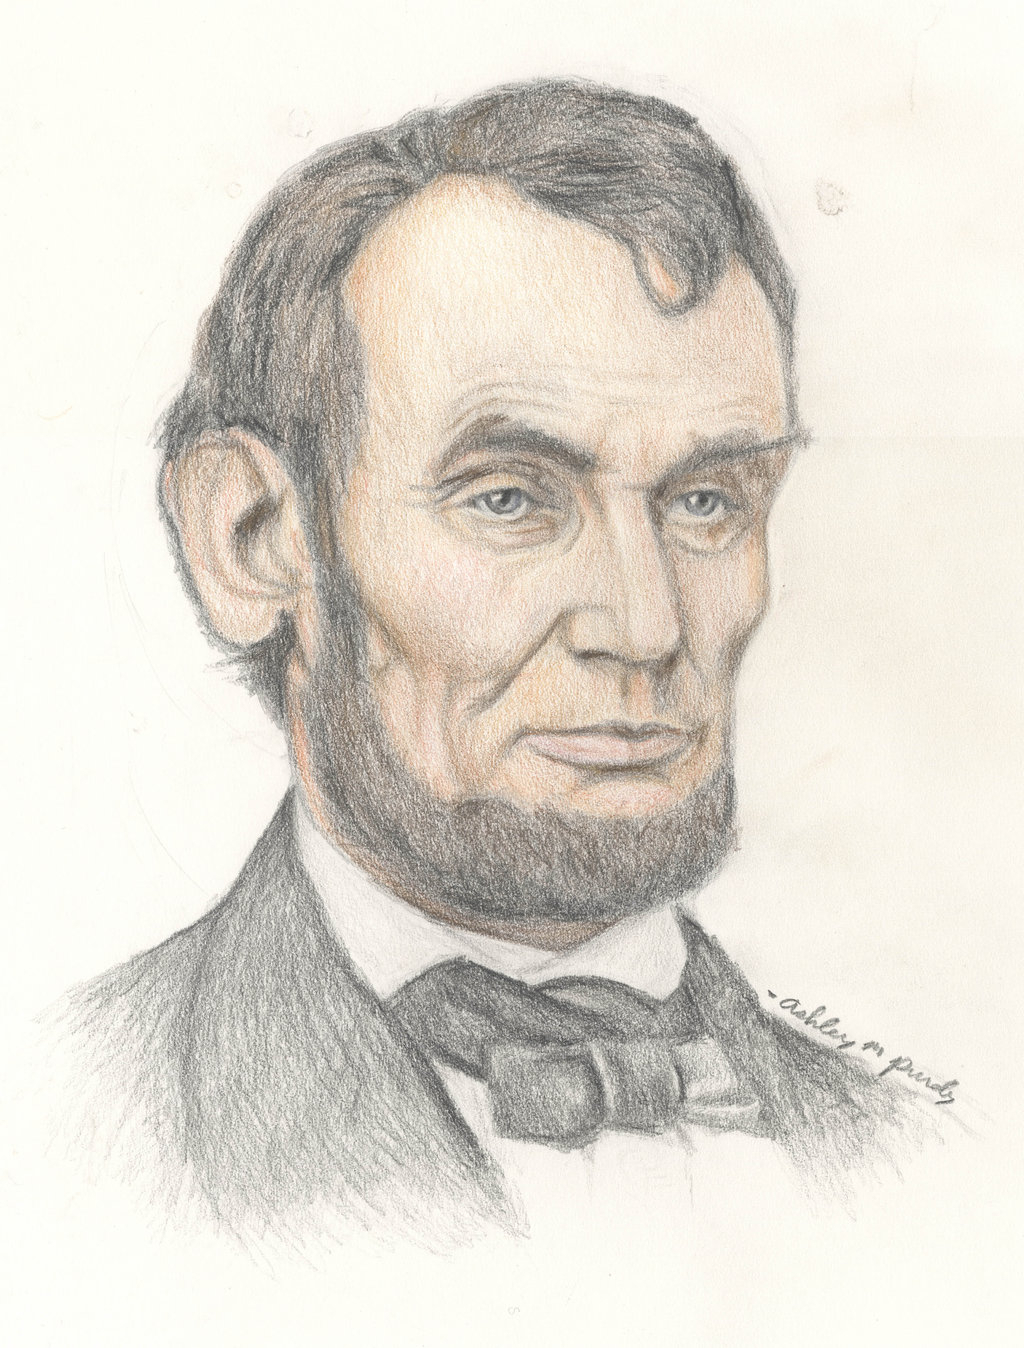 1024x1348 Abraham Lincoln Drawing Pencil Drawings Abraham Lincoln Pencil